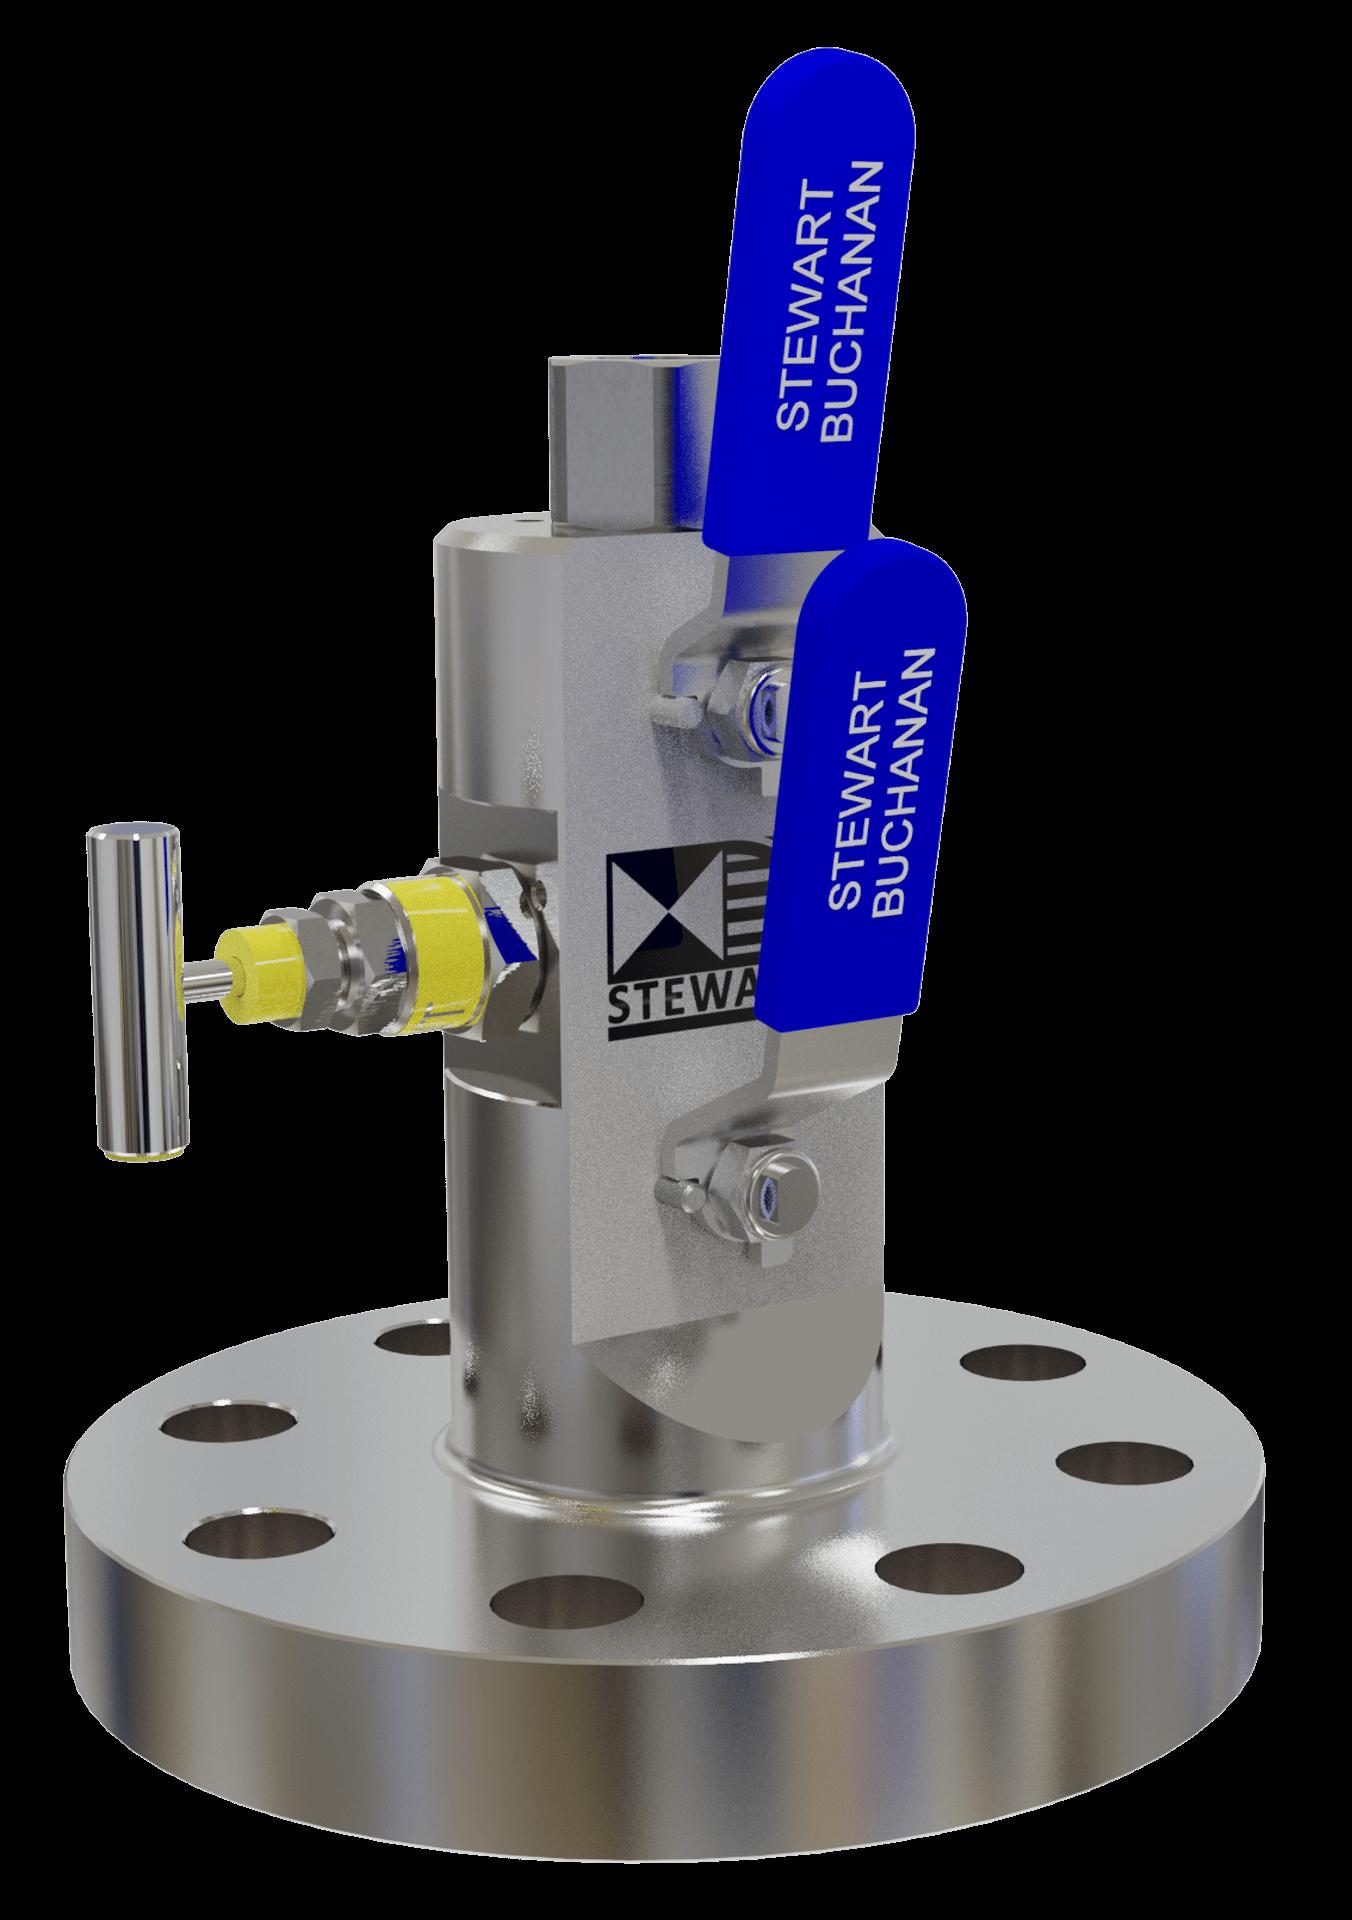 DBB double block and bleed valves Manifold Ball valves kuleventil needle valve nåleventil Stewart Buchanan